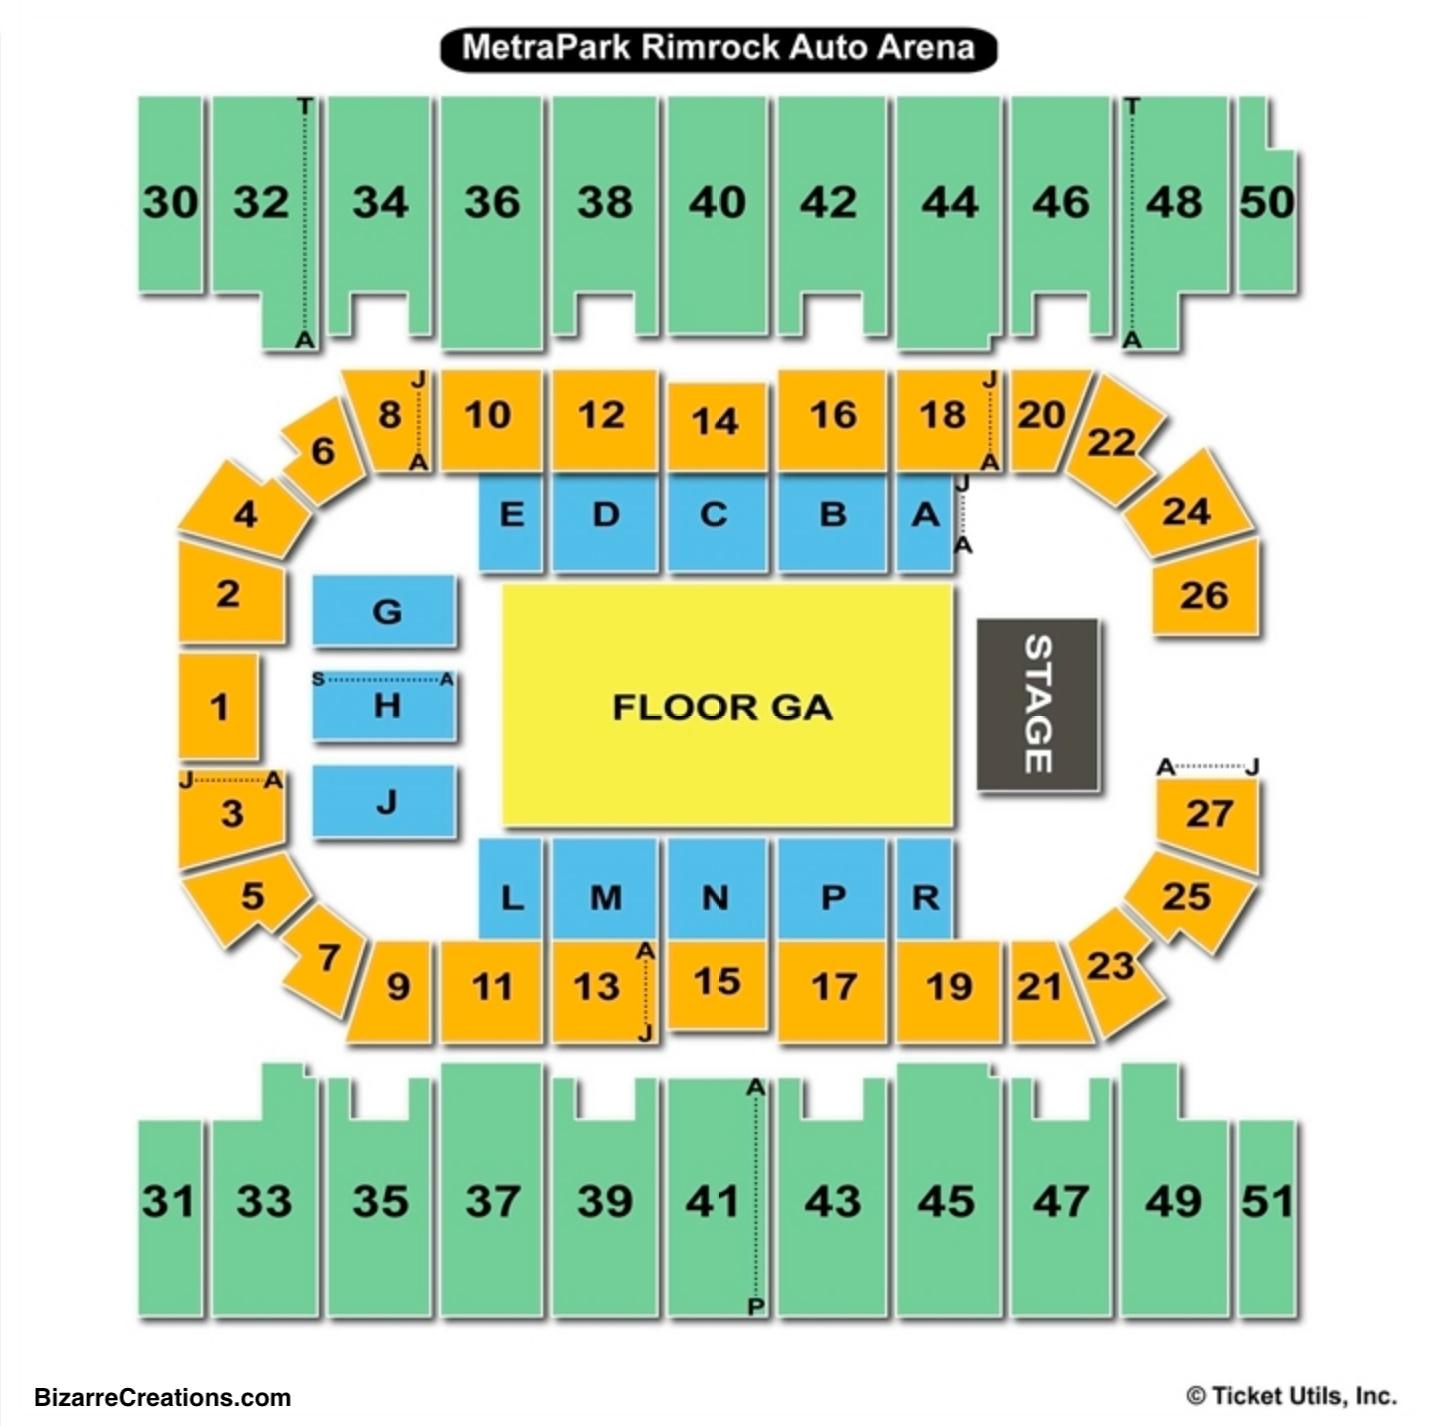 Metrapark Rimrock Auto Arena Seating Chart